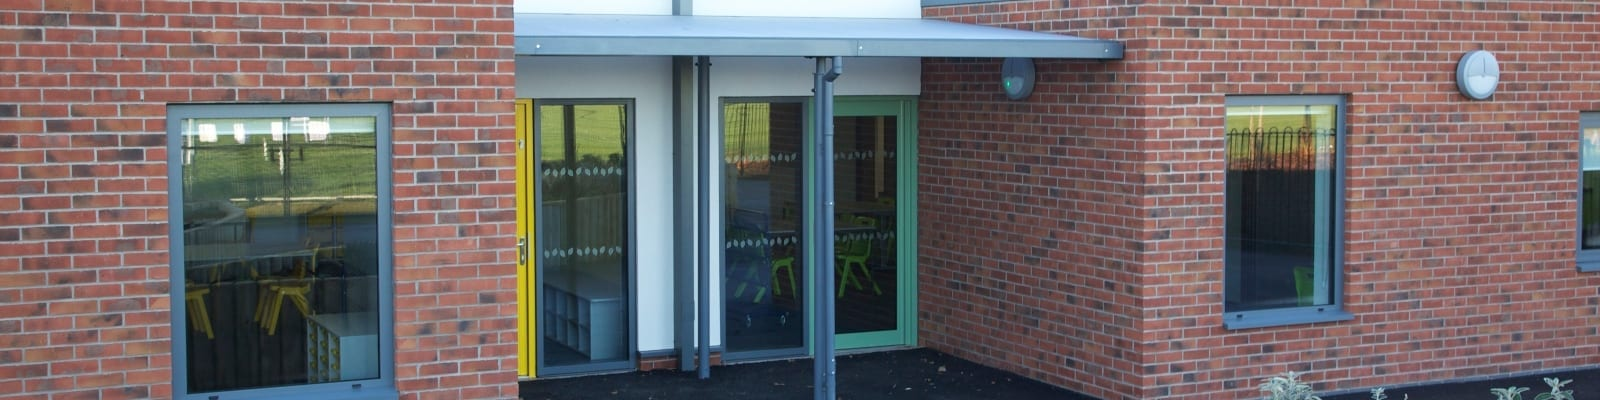 Ashmount School Shelter